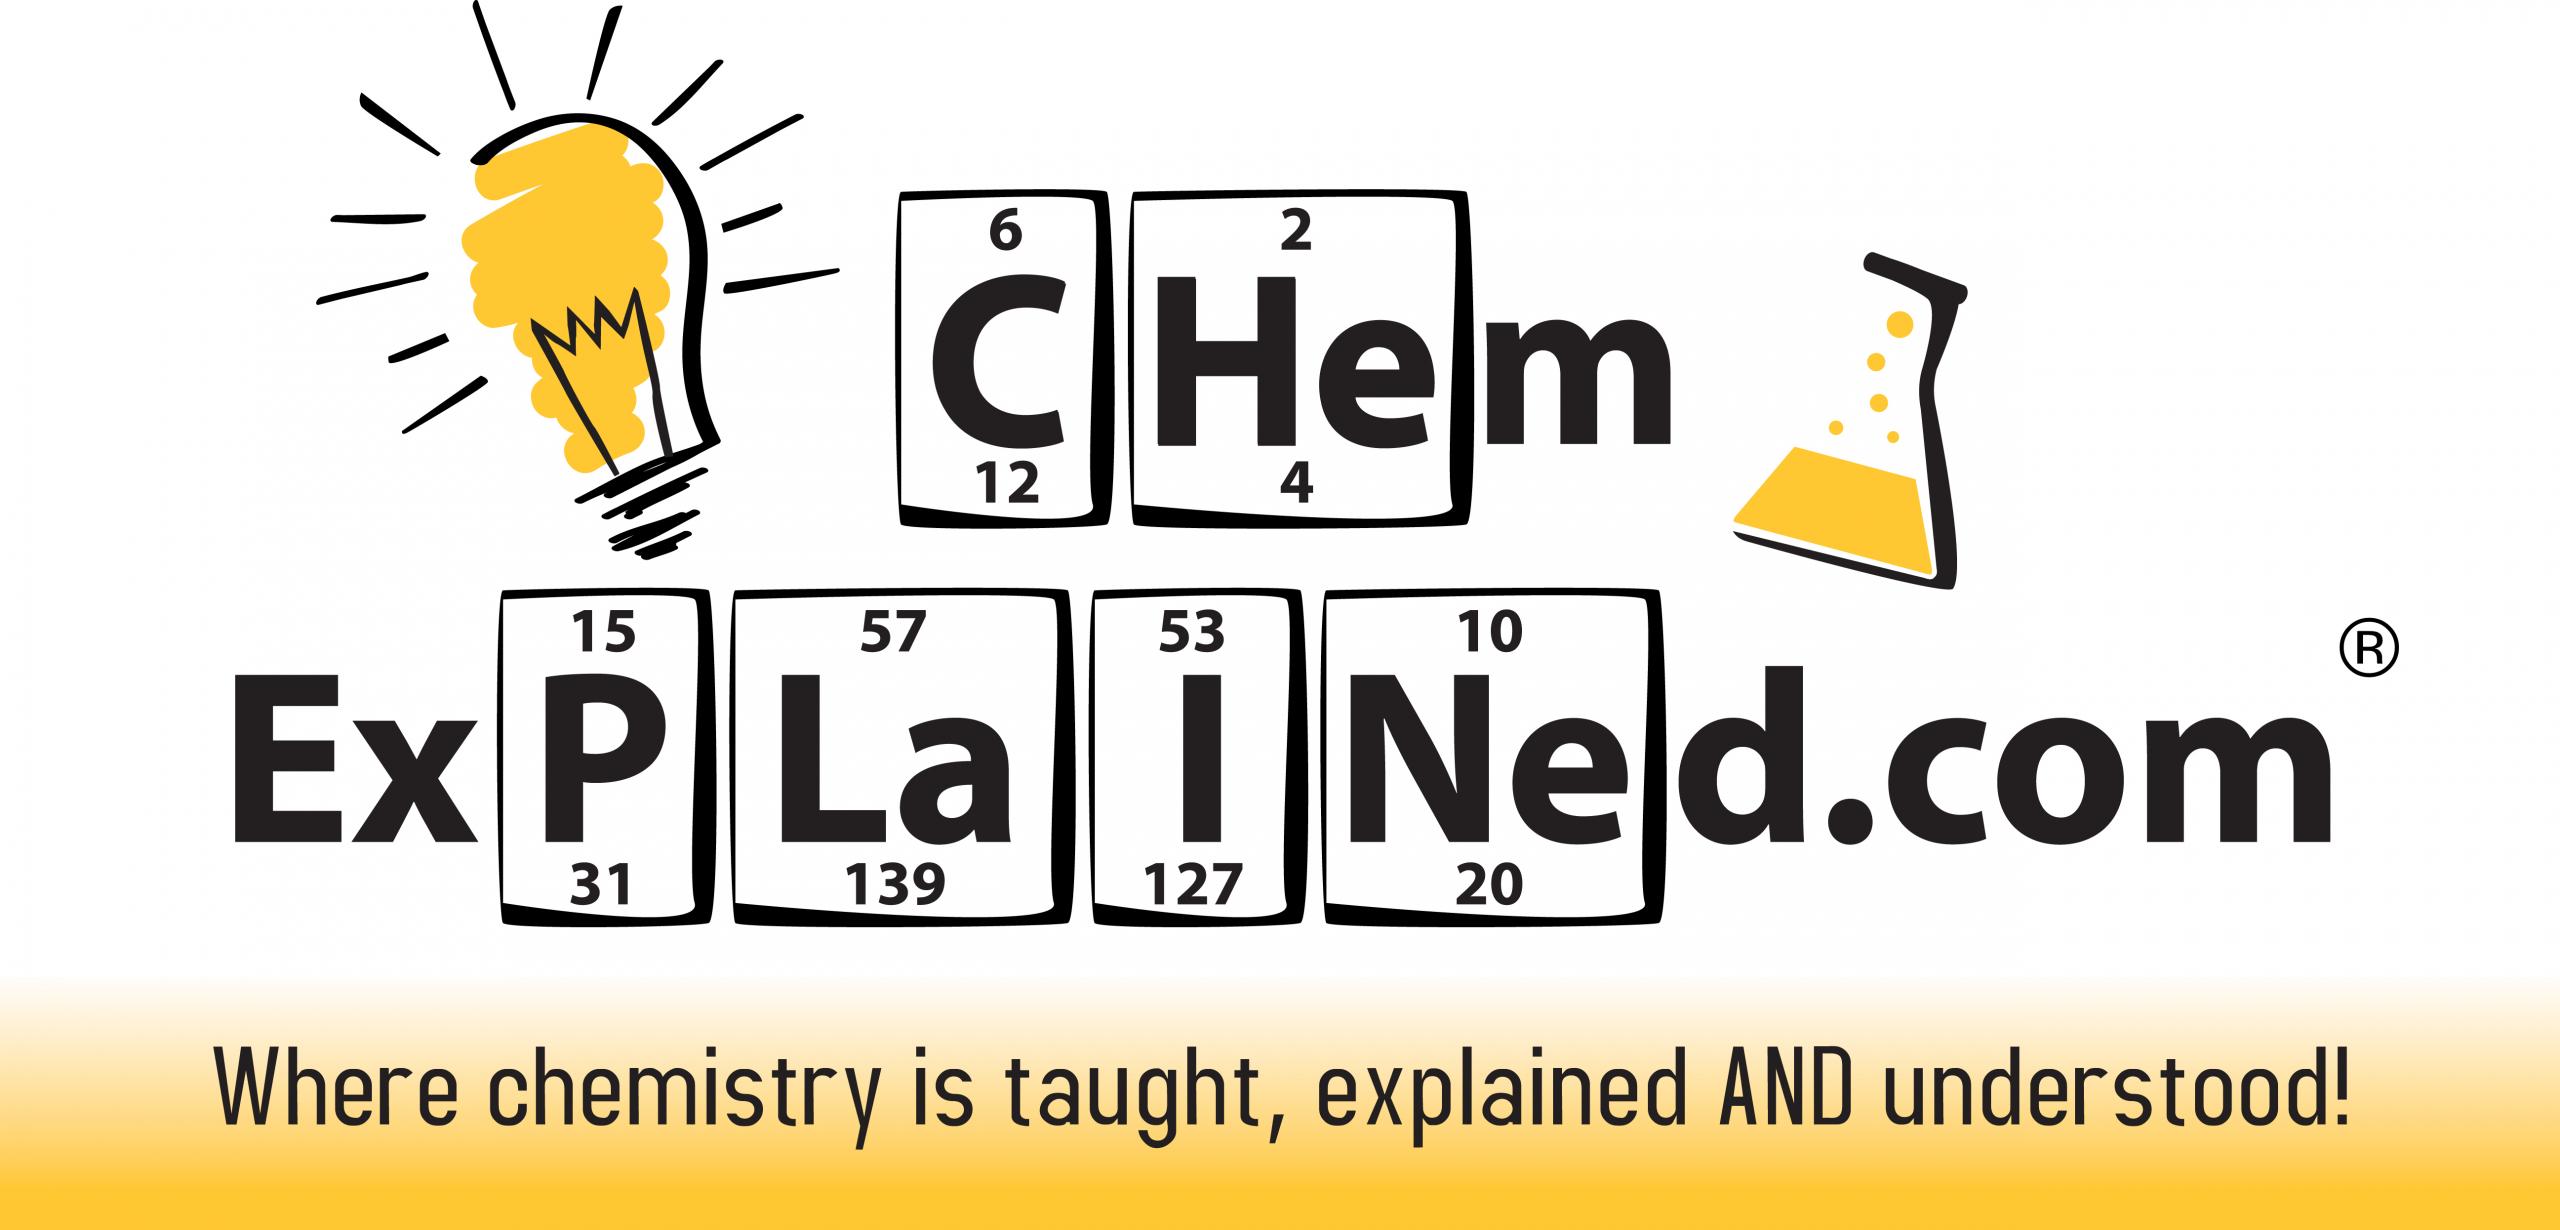 ChemExplained.com Logo